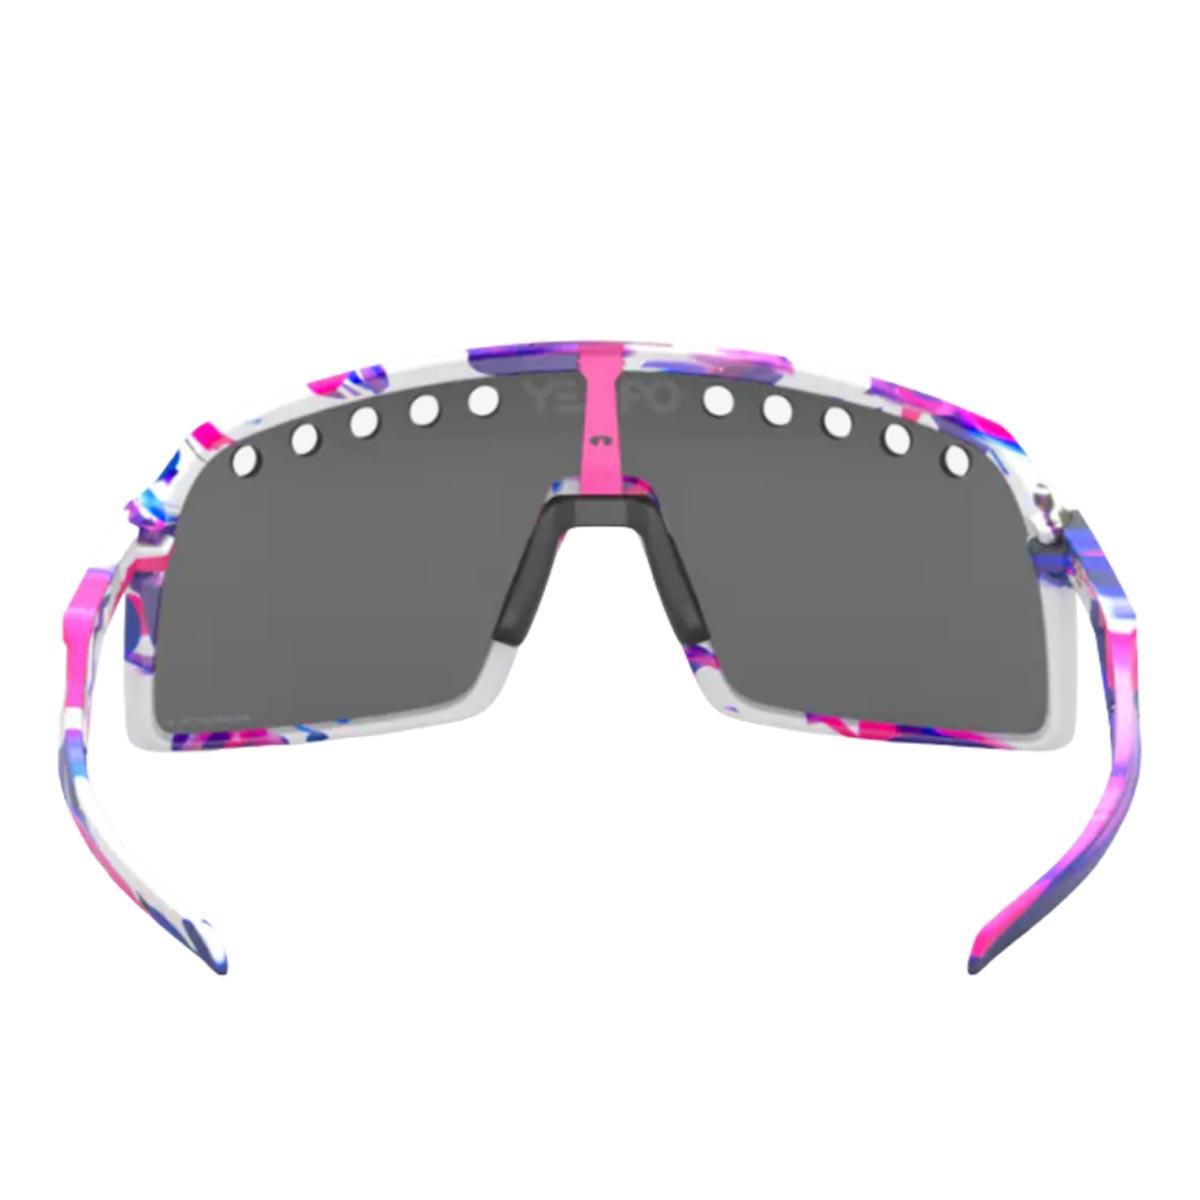 Oculos Para Ciclismo Oakley Sutro Branco Roxo e Rosa Eyeshade Kokoro com Lente Prizm Black Escura